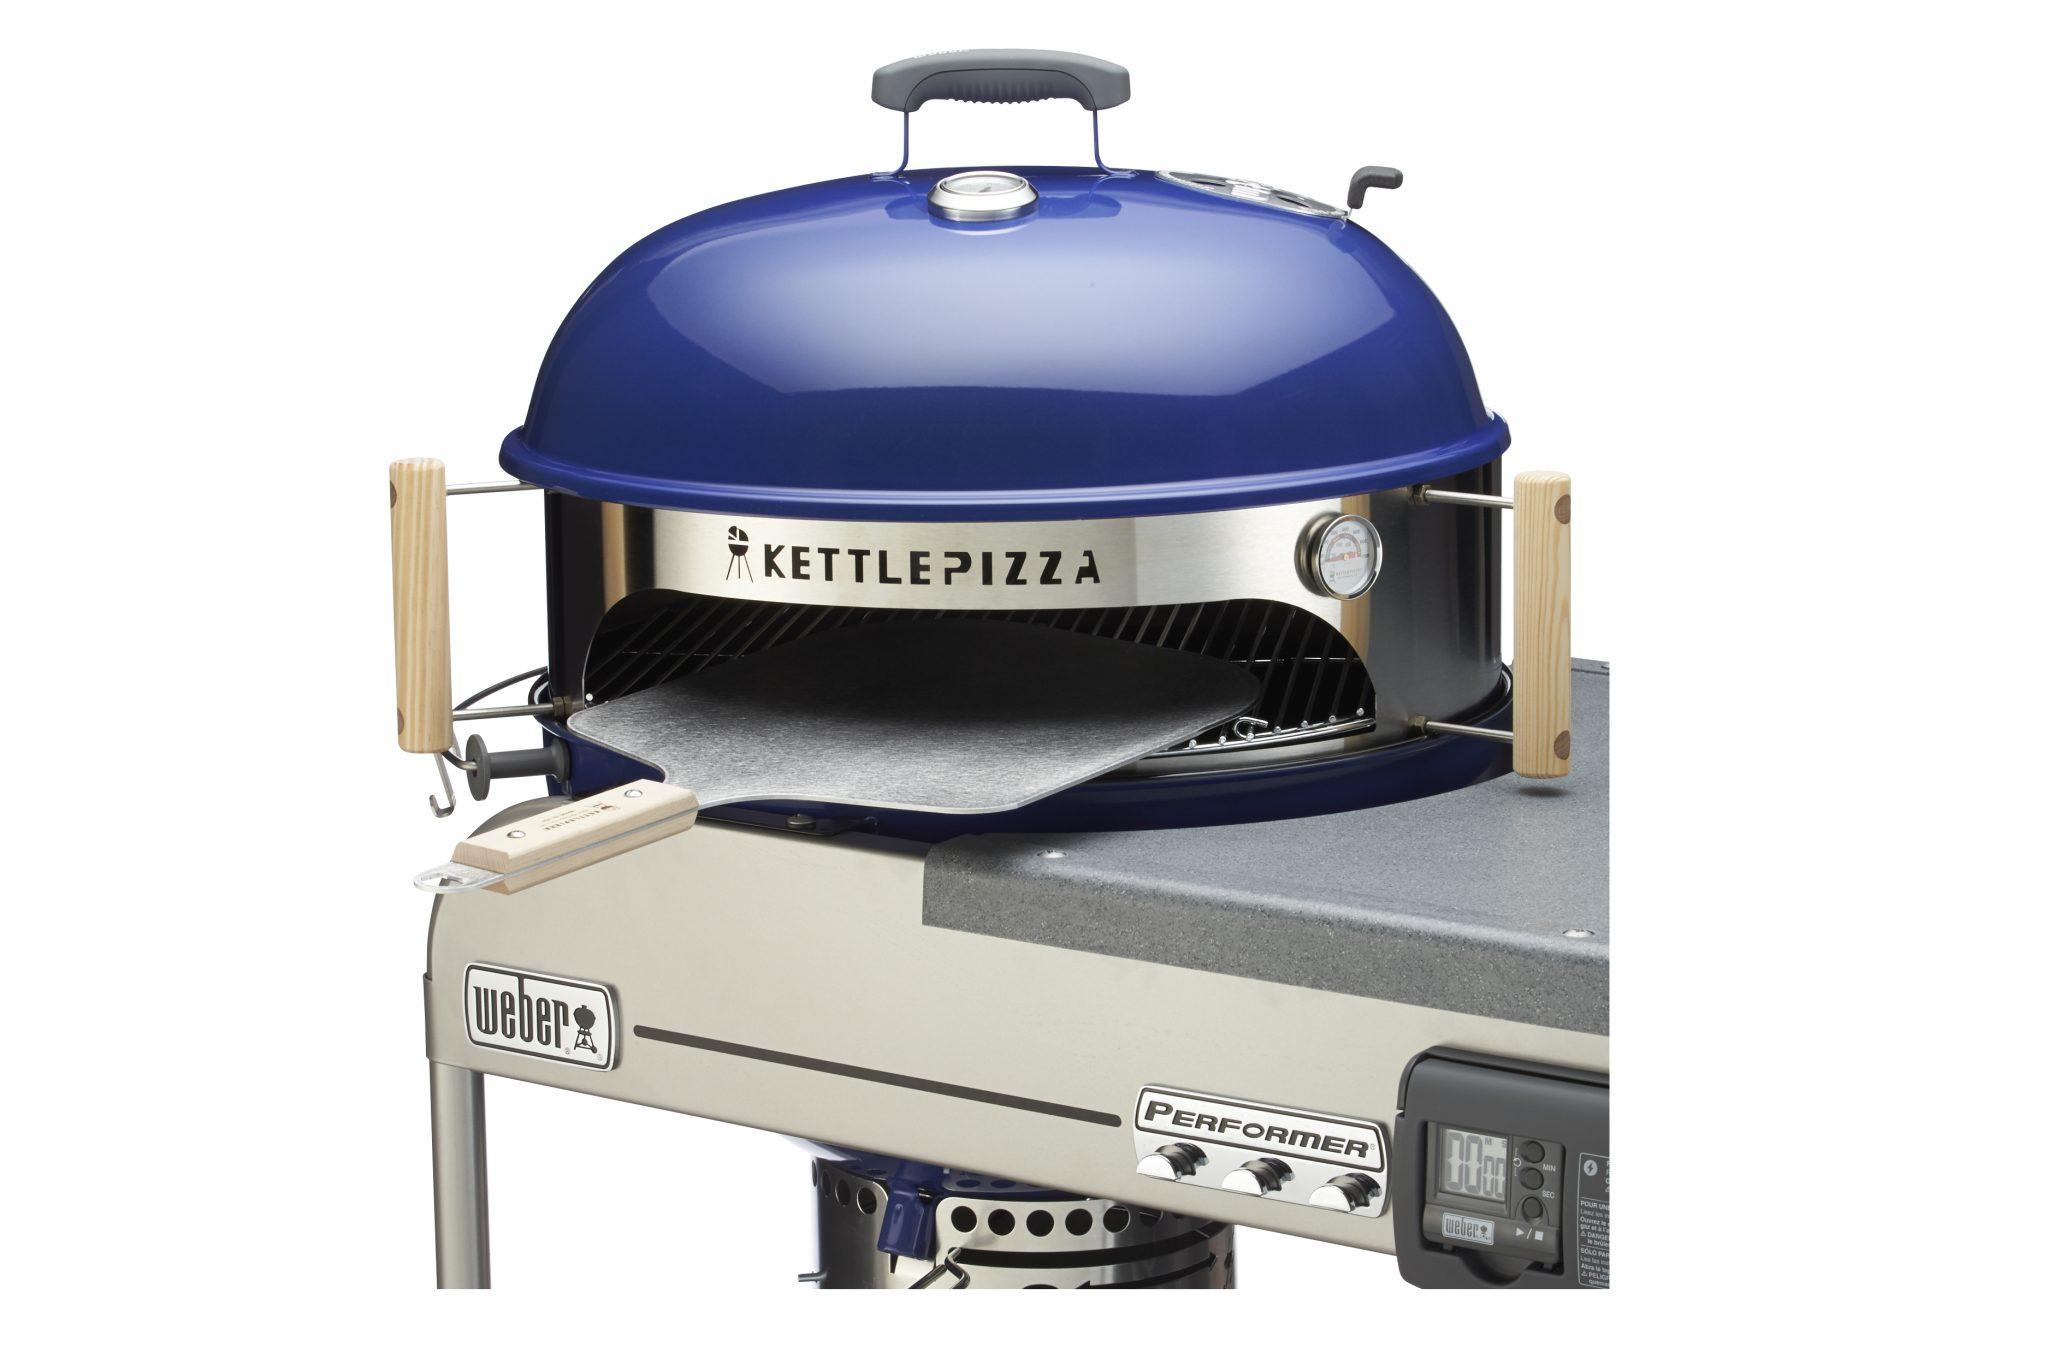 KettlePizzaDeluxeAV1F13+-+400.00+TL-haziran2015